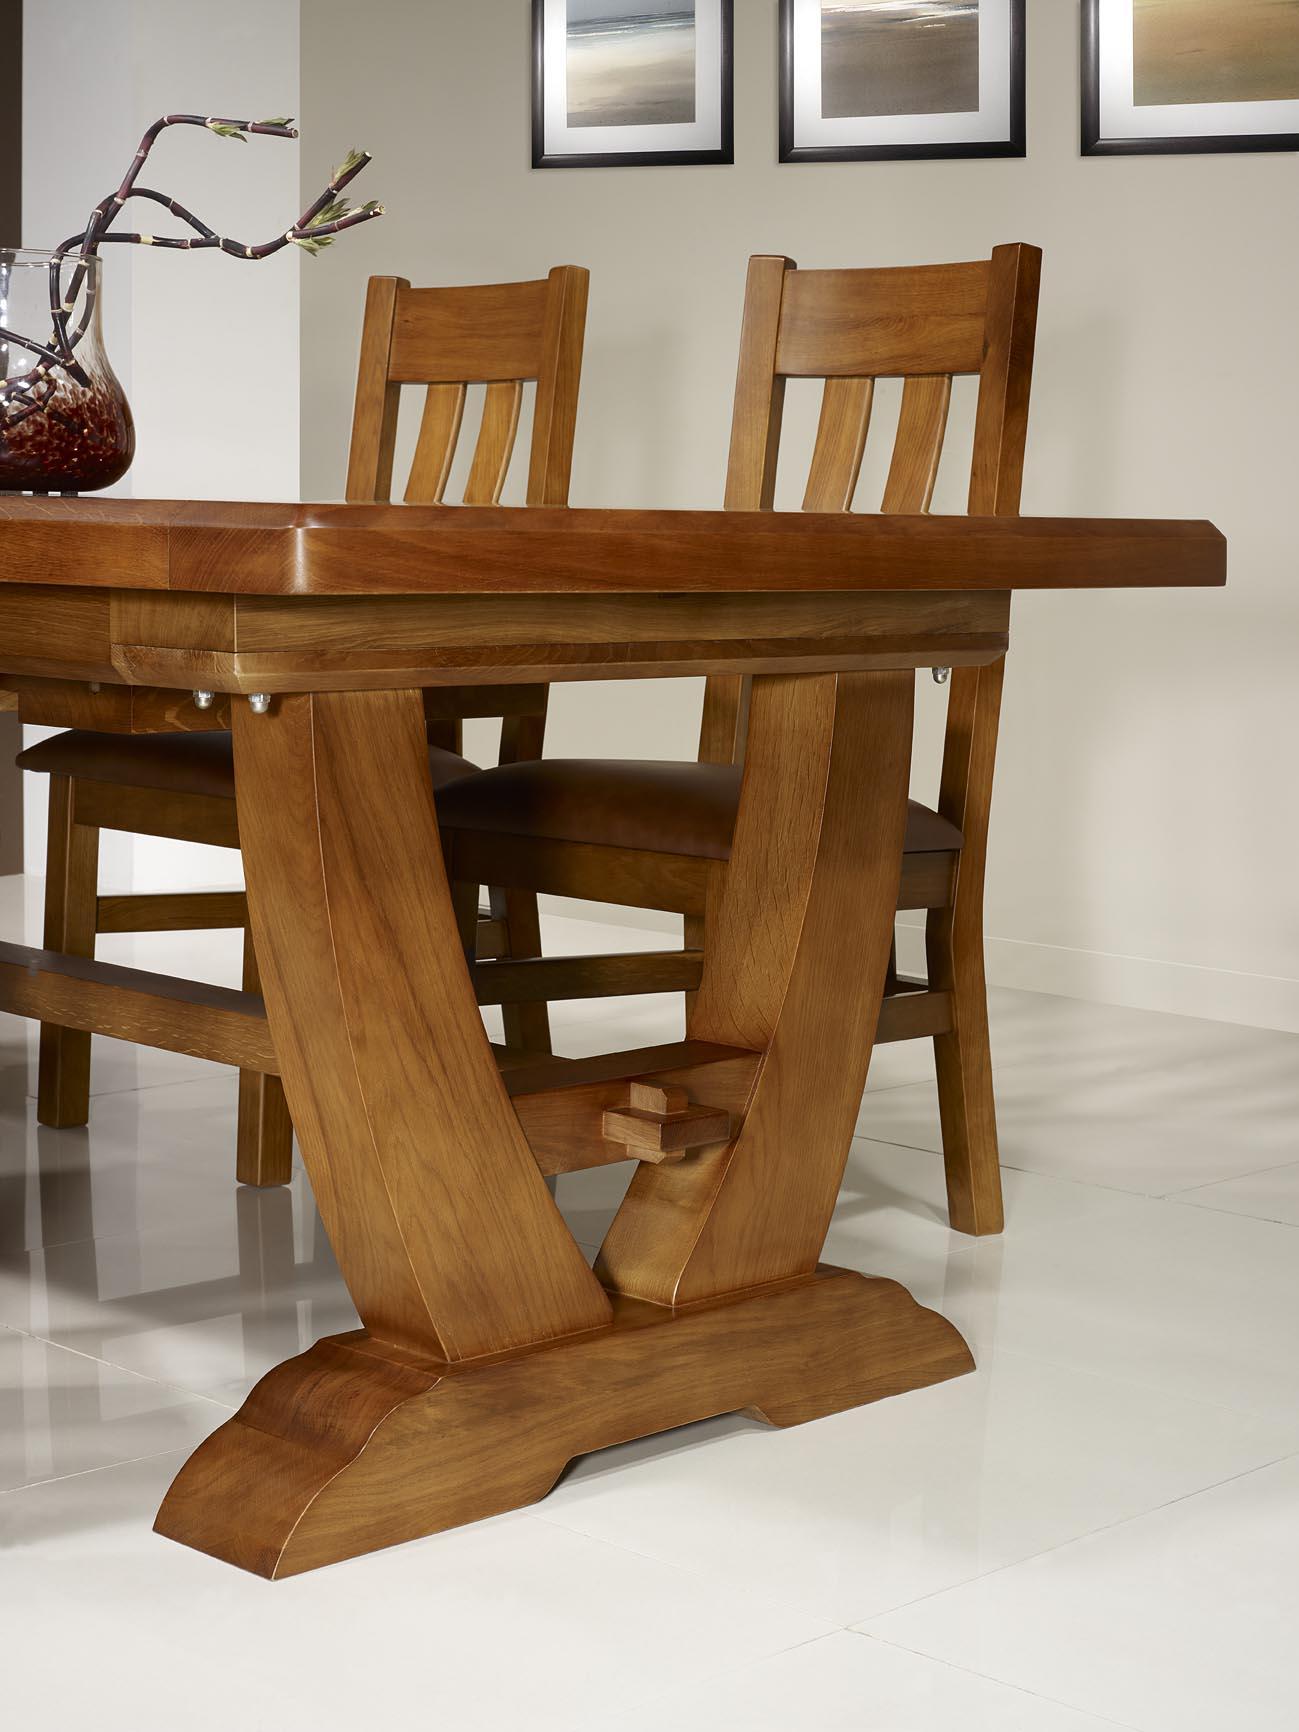 table monast re eliot 220x110 en ch ne massif 2 allonges. Black Bedroom Furniture Sets. Home Design Ideas